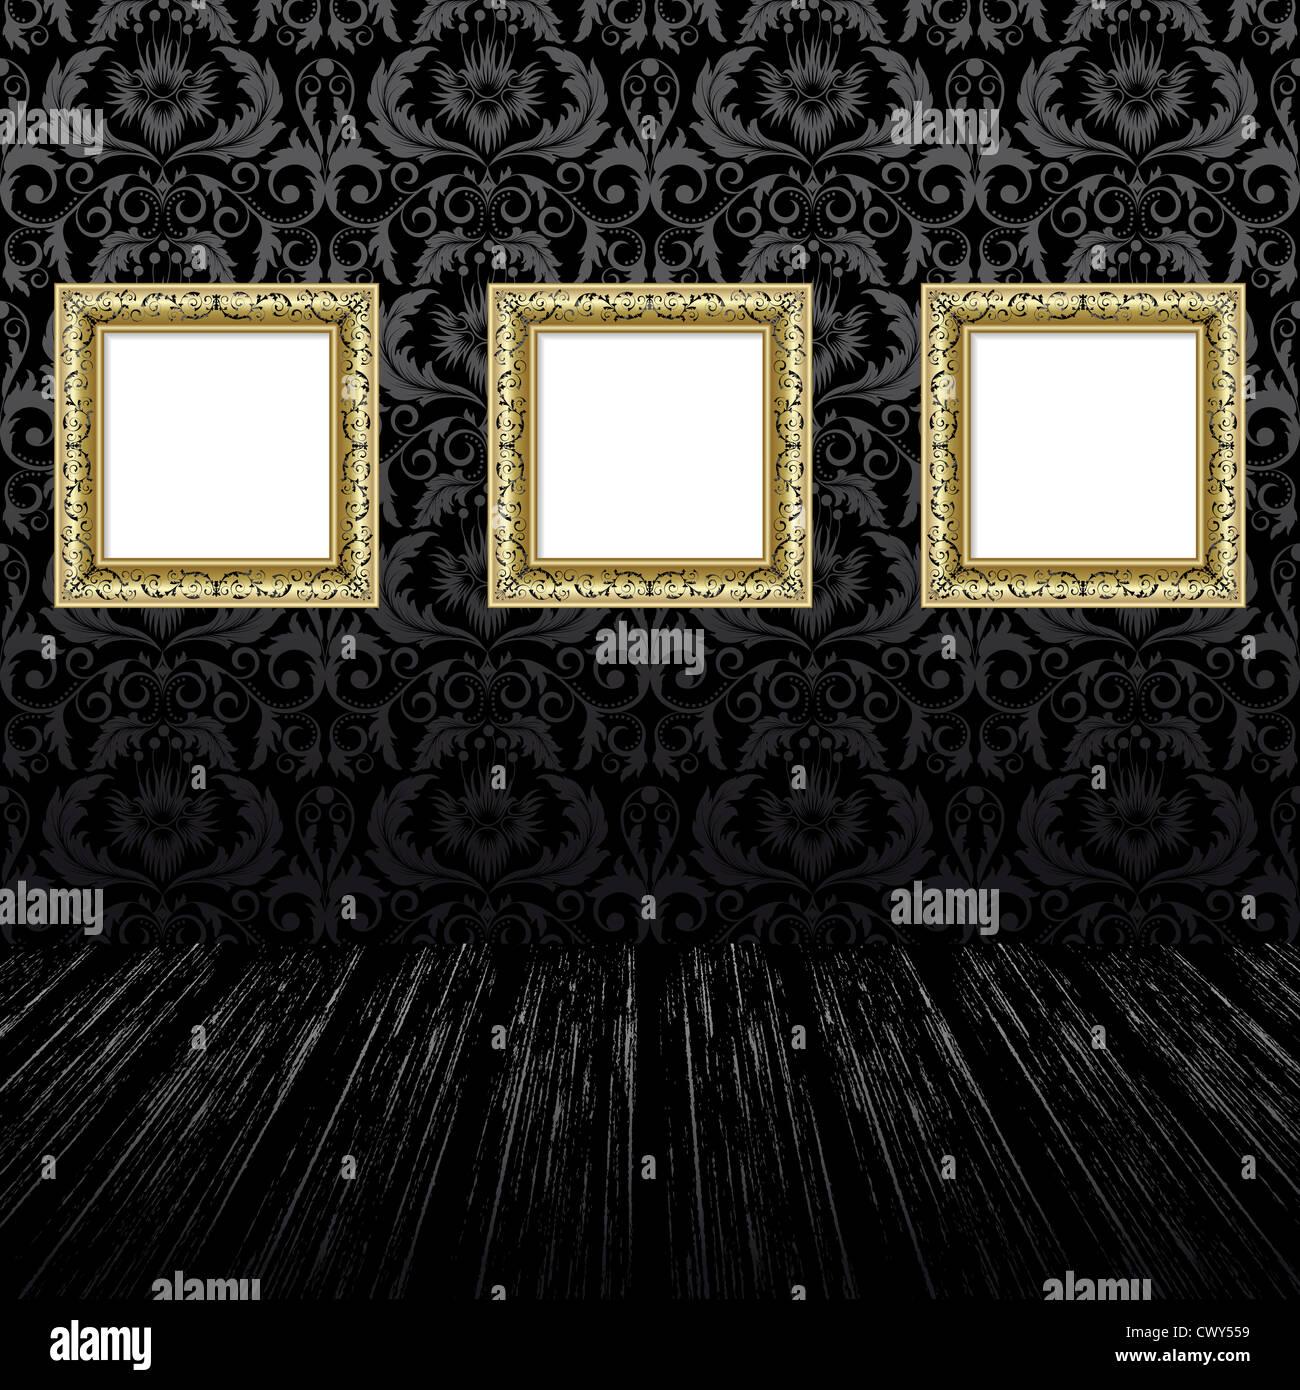 schwarze tapeten perfect rolle hochwertige vlies tapete coole retrowelle with schwarze tapeten. Black Bedroom Furniture Sets. Home Design Ideas